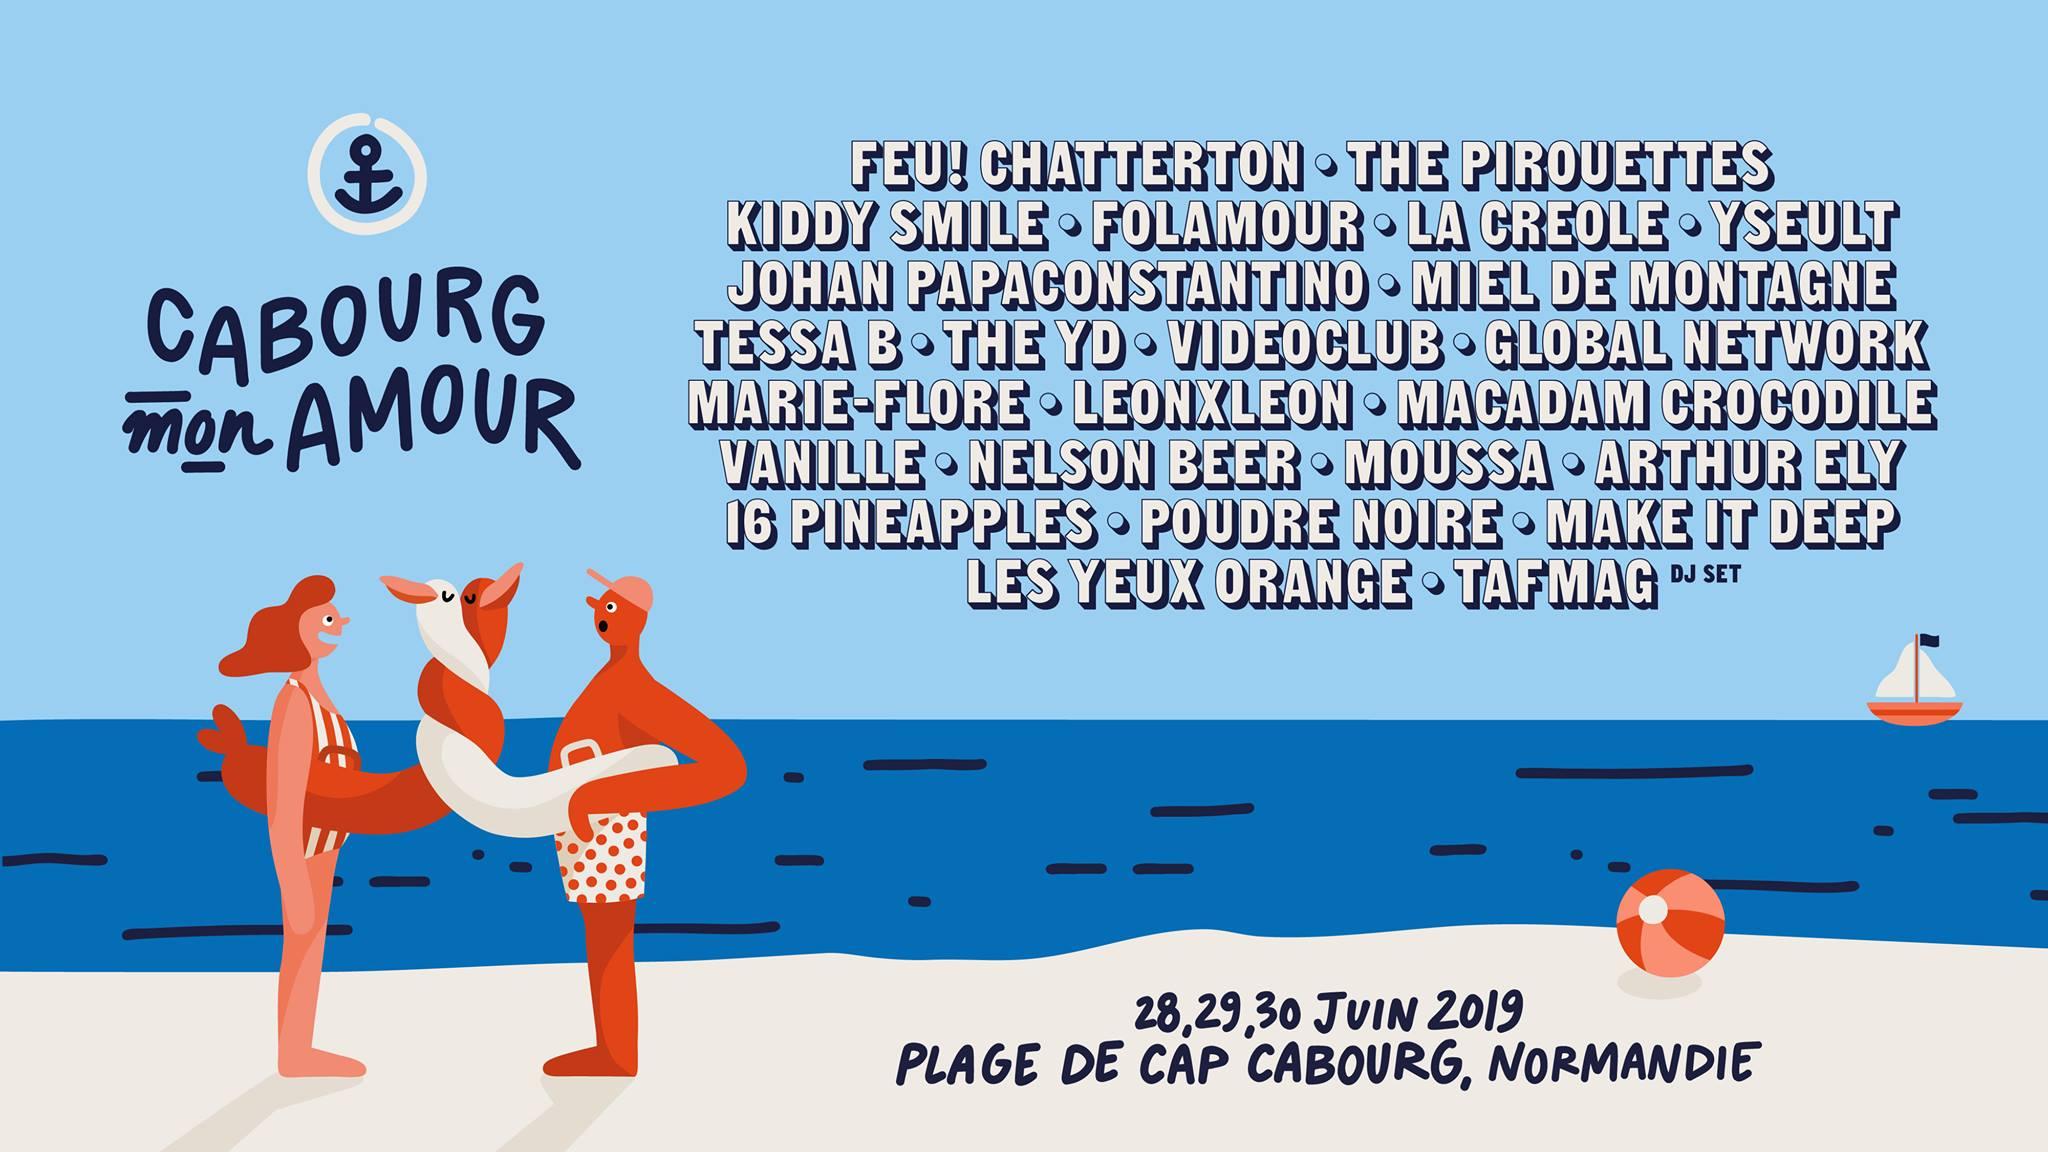 festival-cabourg-mon-amour-culturclub.jpg